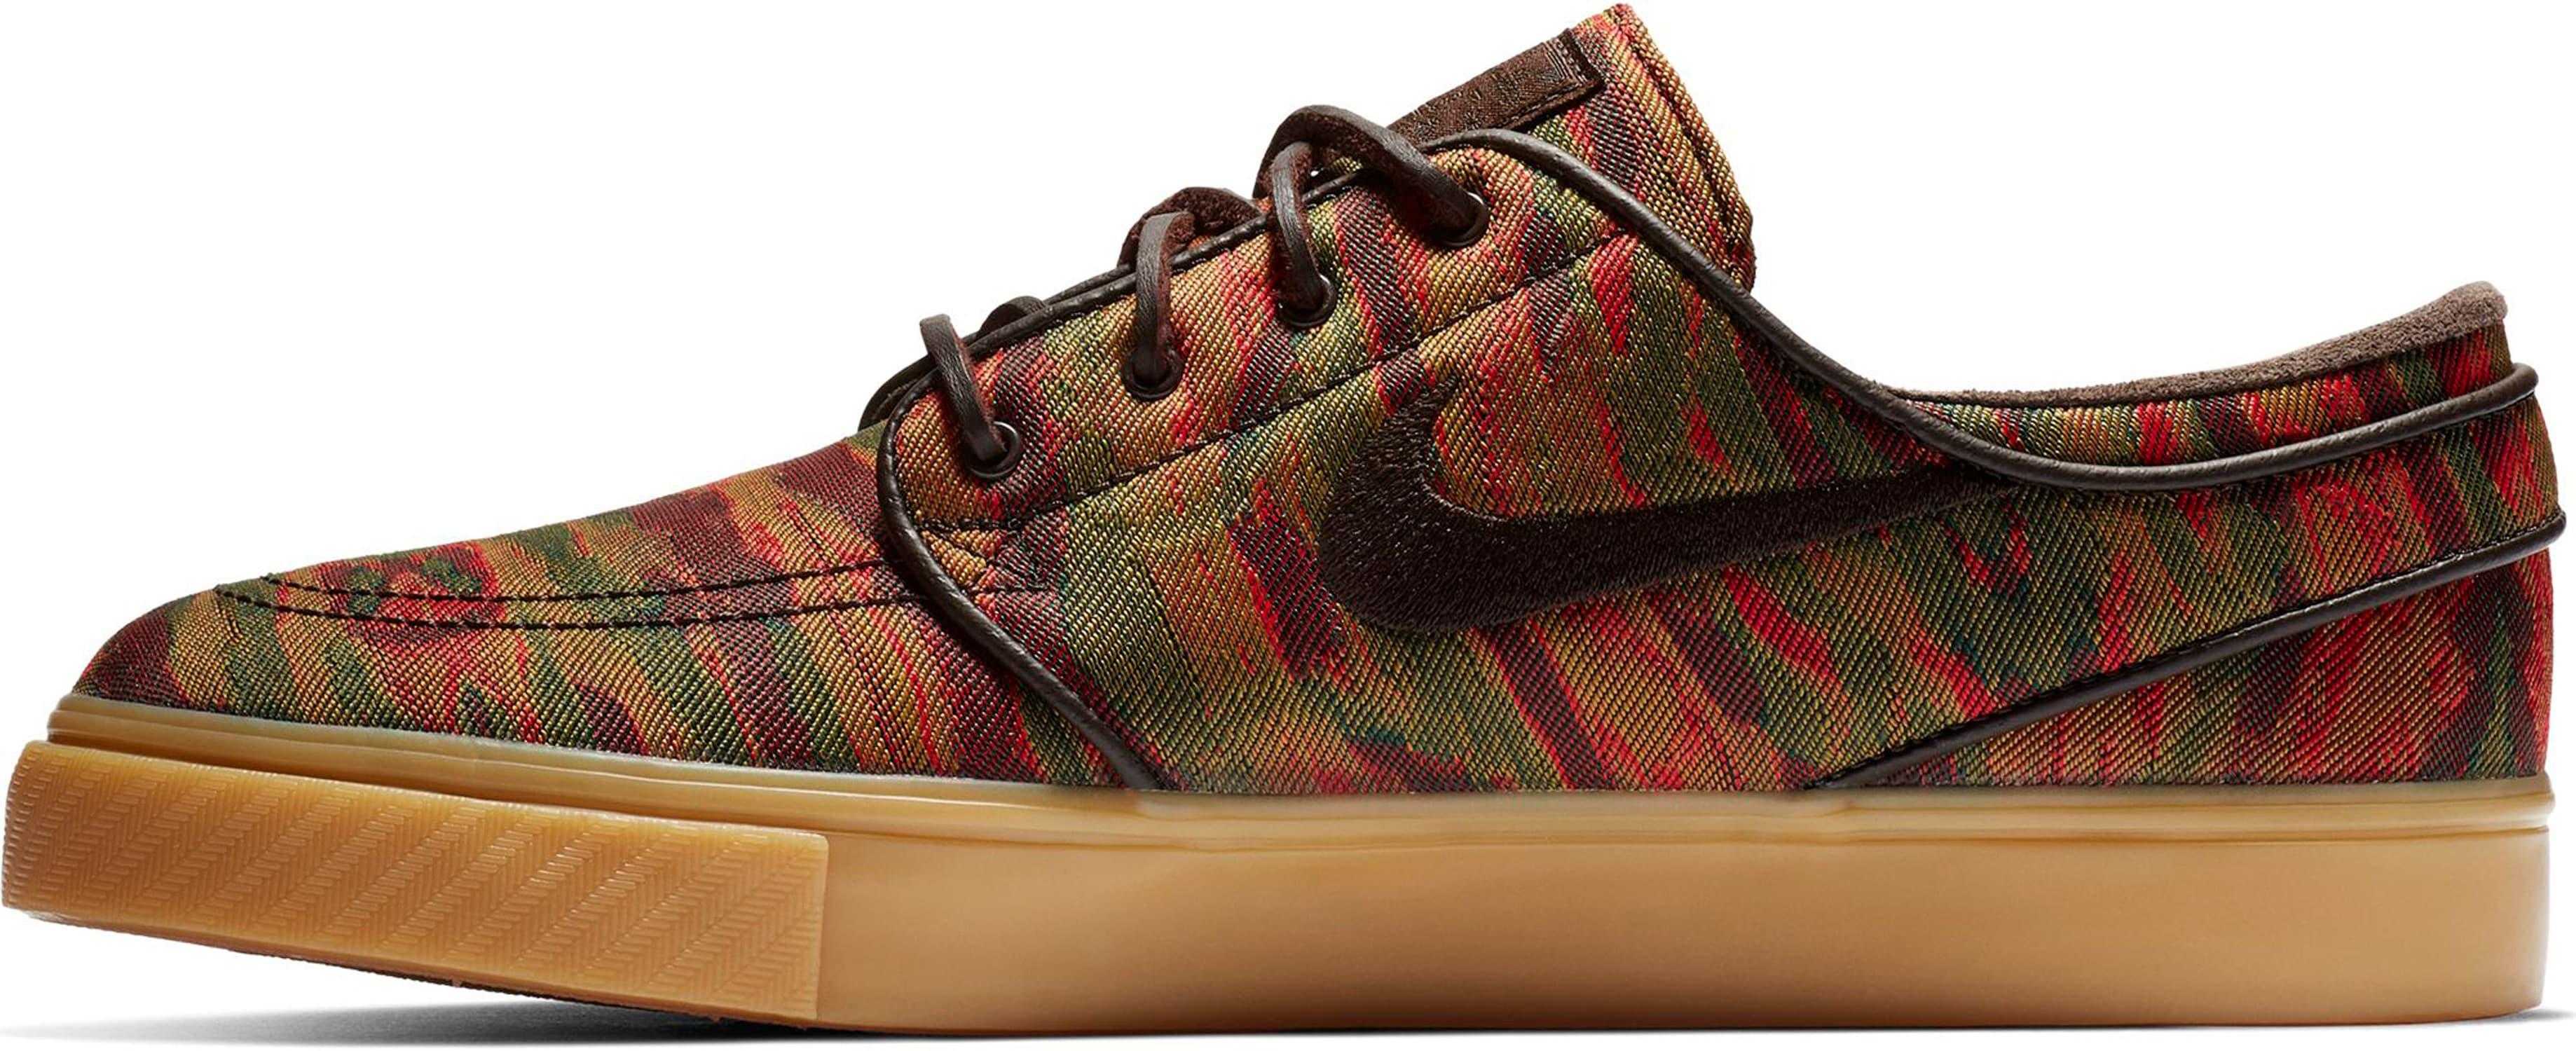 6b23761881be Nike SB Zoom Stefan Janoski Canvas Premium Skate Shoes - thumbnail 3